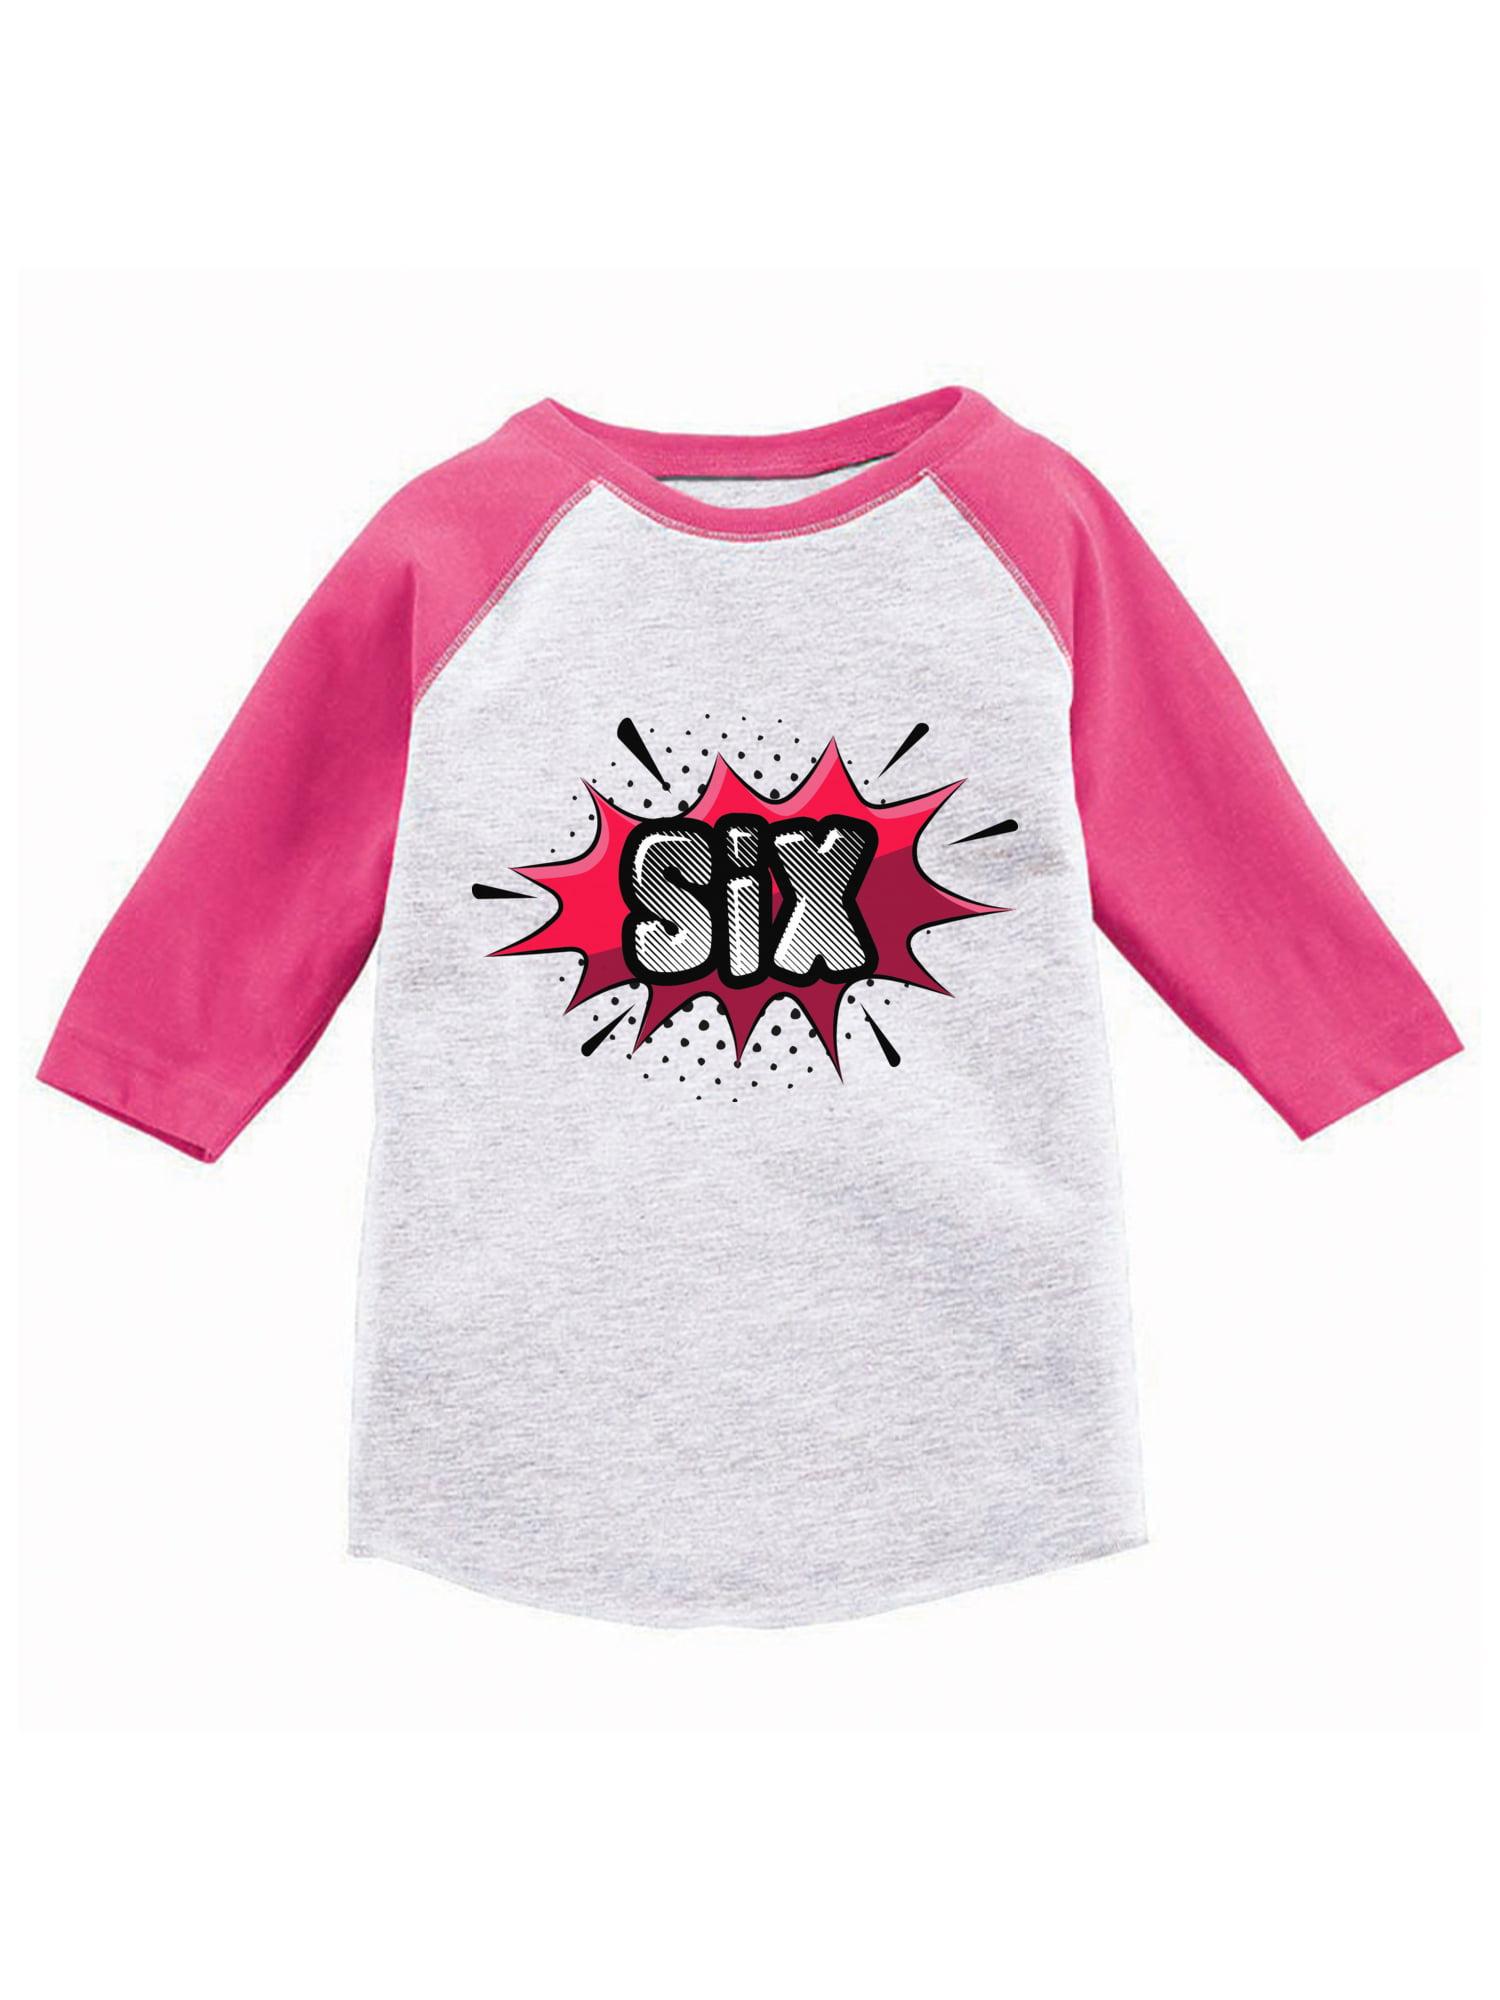 Awkward Styles Awkward Styles 6th Birthday Raglan Shirt Sixth Birthday Shirt Boys Girls Kids 6th Birthday Gift For 6th Birthday Kids Youth Raglan Pop Art Superhero Shirt Pop Art Style Shirt